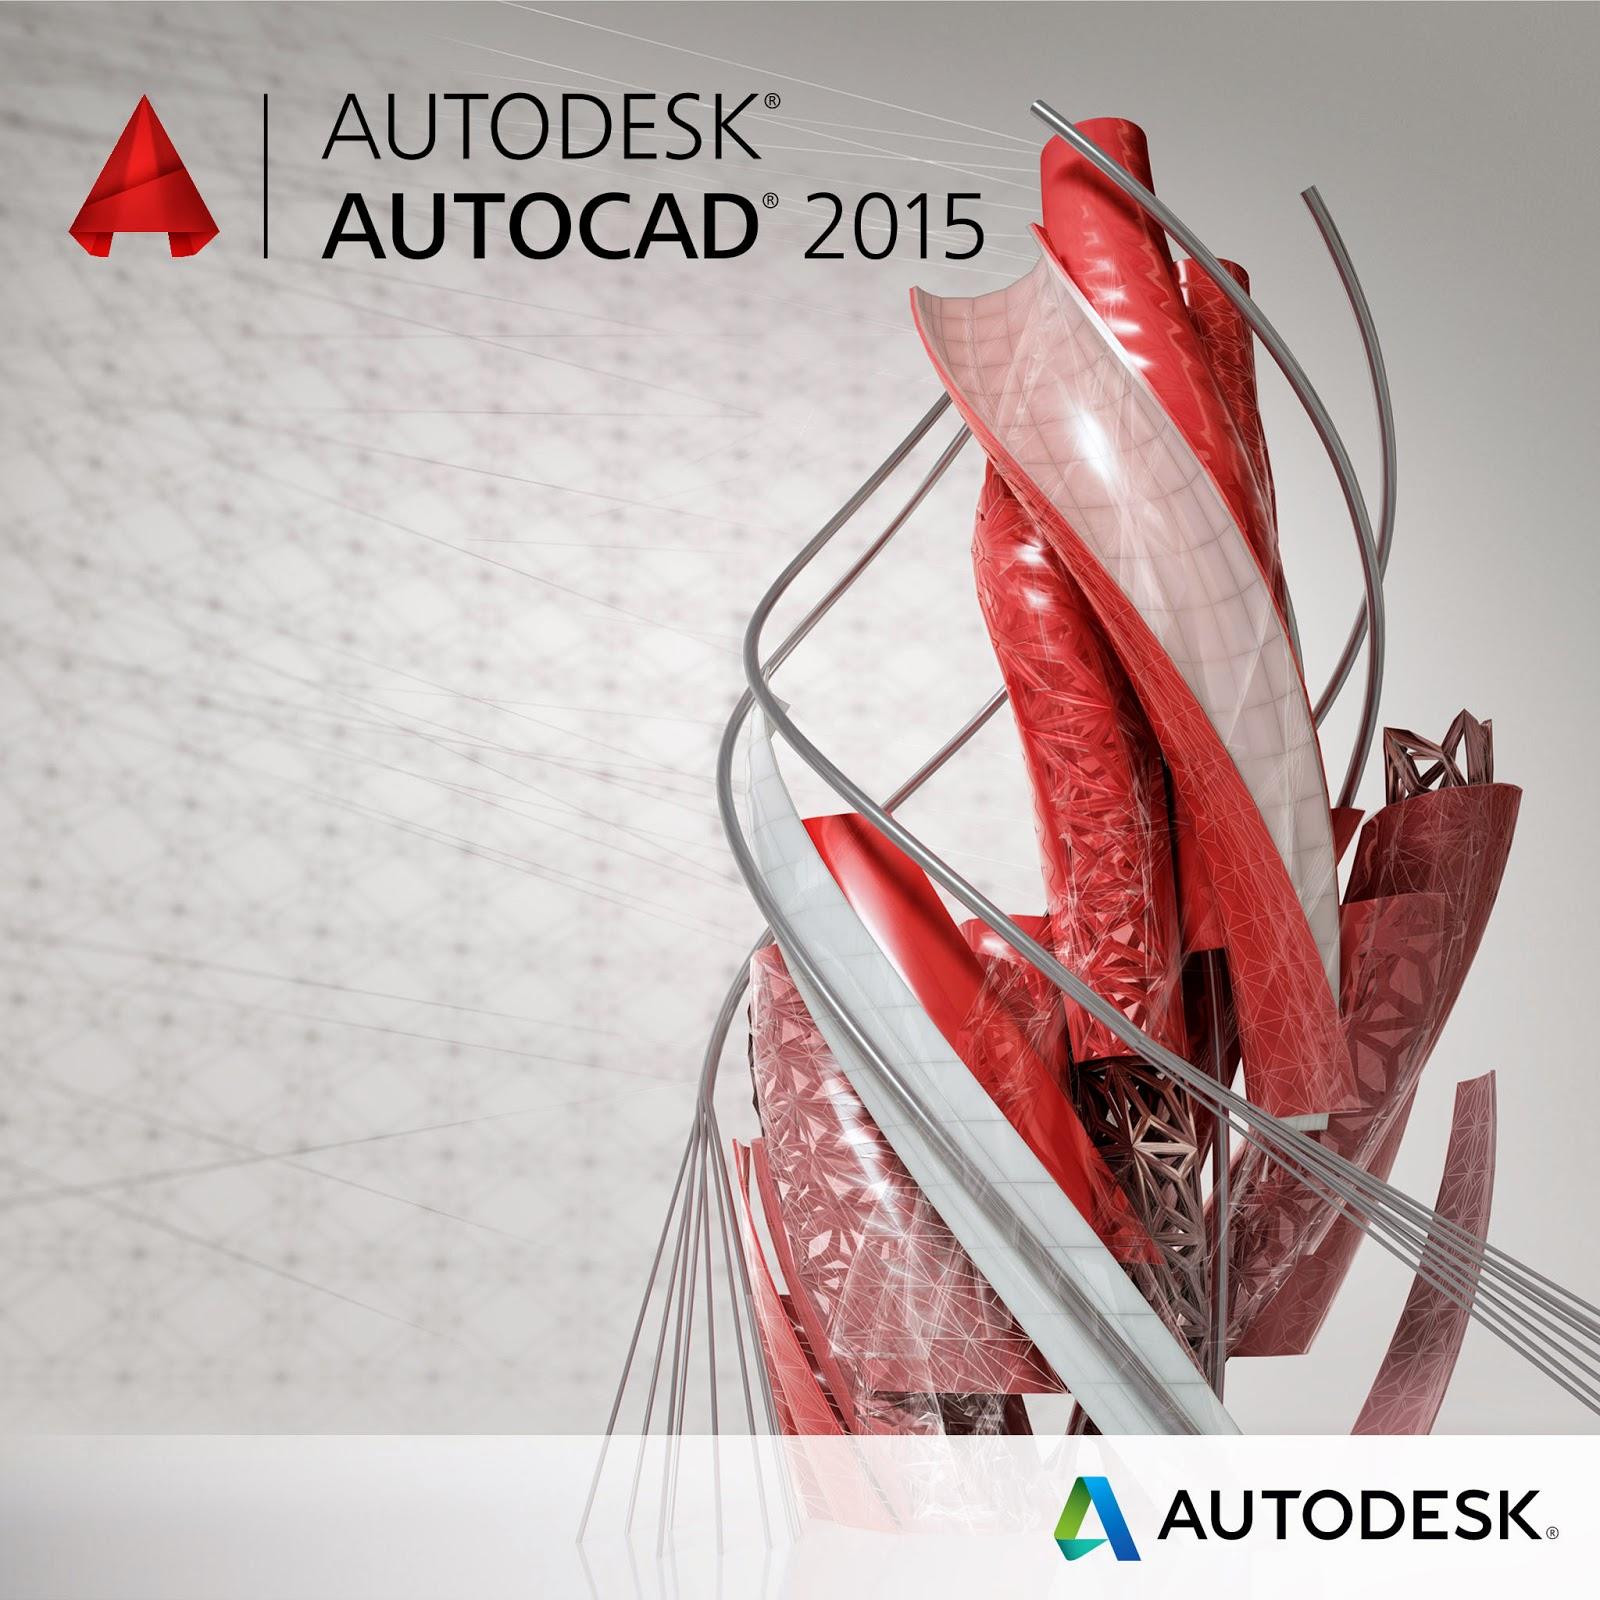 Autodesk Autocad 2015, Autodesk Autocad 2015 indir, Autodesk Autocad 2015 32bit indir, Autodesk Autocad 2015 64bit indir, Autodesk Autocad 2015 serial, Autodesk Autocad 2015 full indir